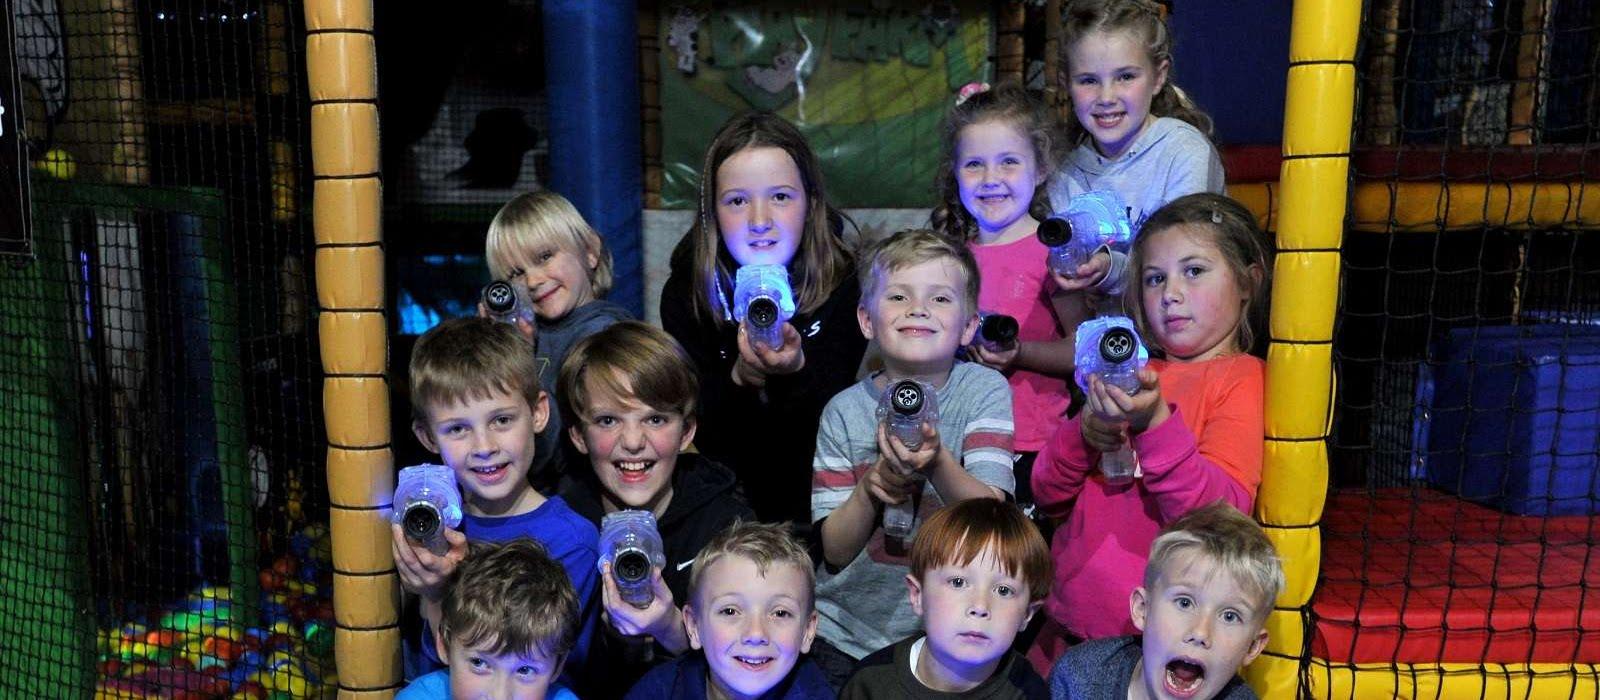 Best Laser Tag Parties In Cheltenham | Play Farm